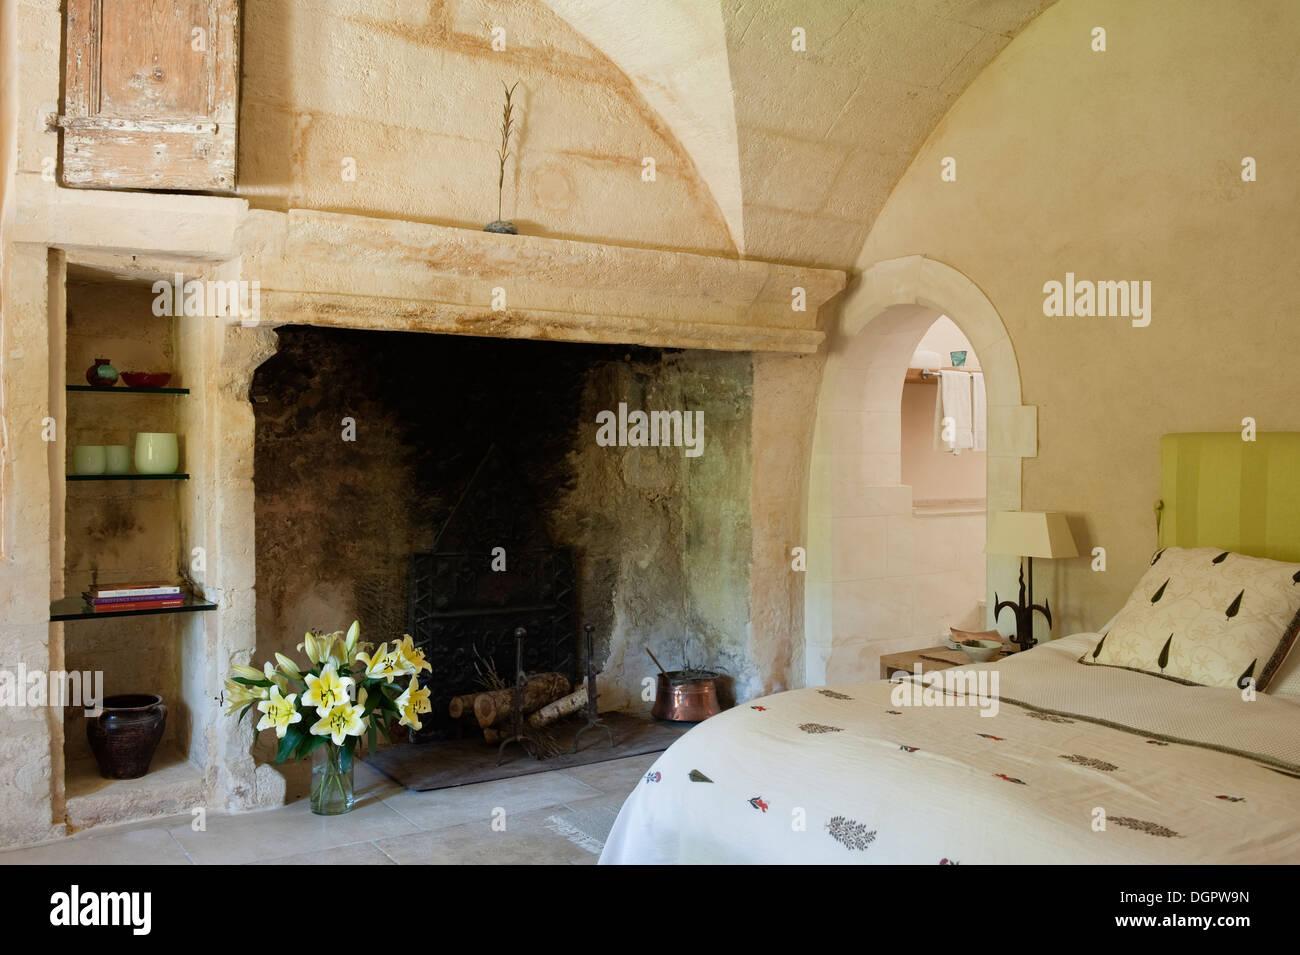 Royalty Free Image: 61968417 - Alamy